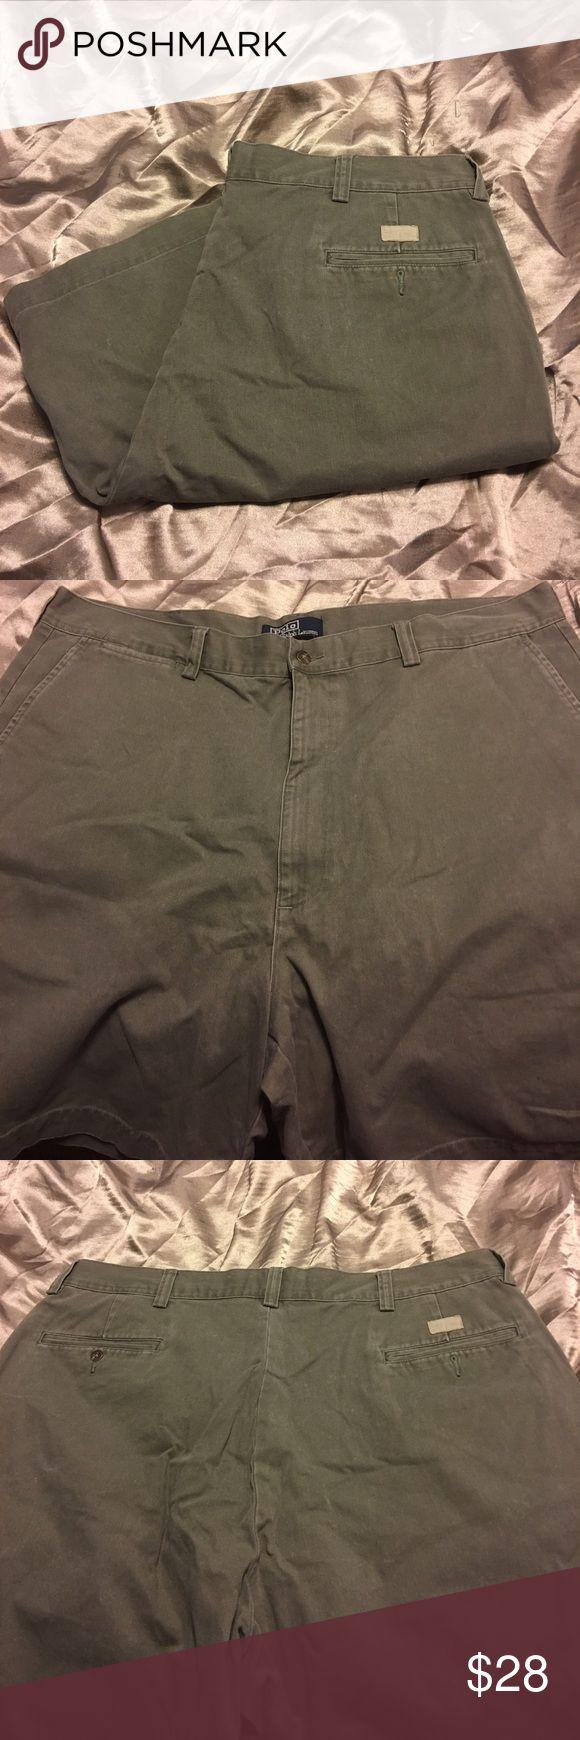 POLO by Ralph Lauren shorts POLO by Ralph Lauren men's flat front shorts size 40 inseam 8' Polo by Ralph Lauren Shorts